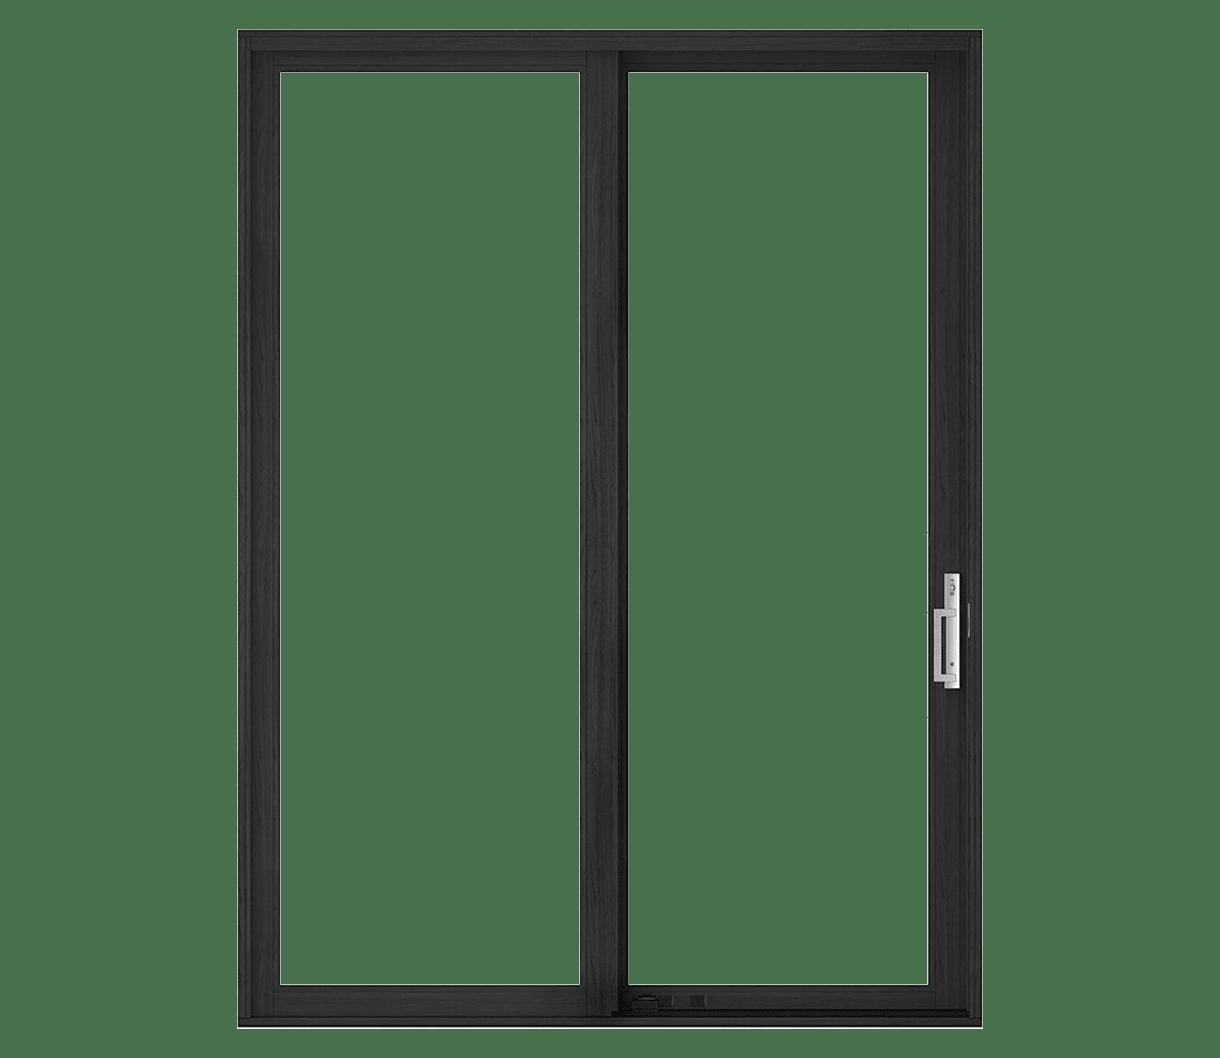 large illustration of a sliding patio door